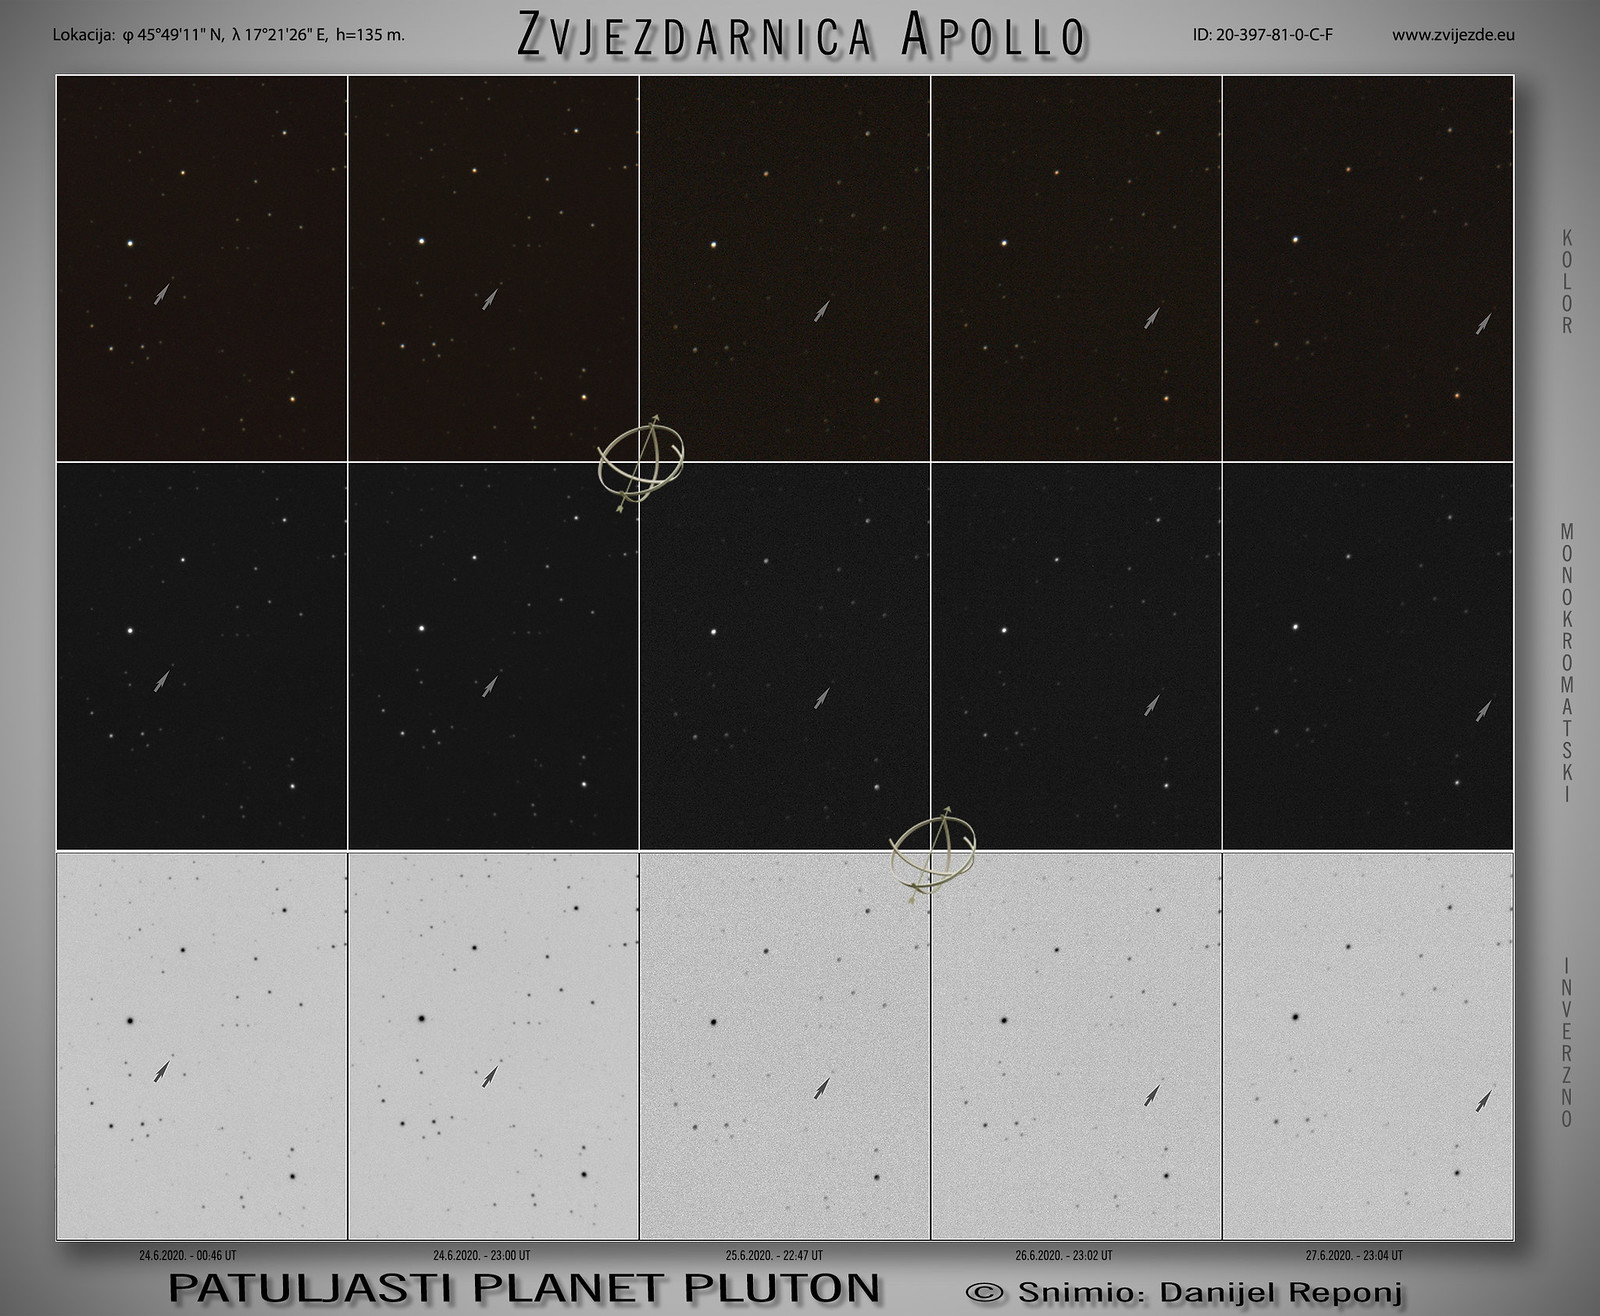 Patuljasti planet Pluton, 06.2020.